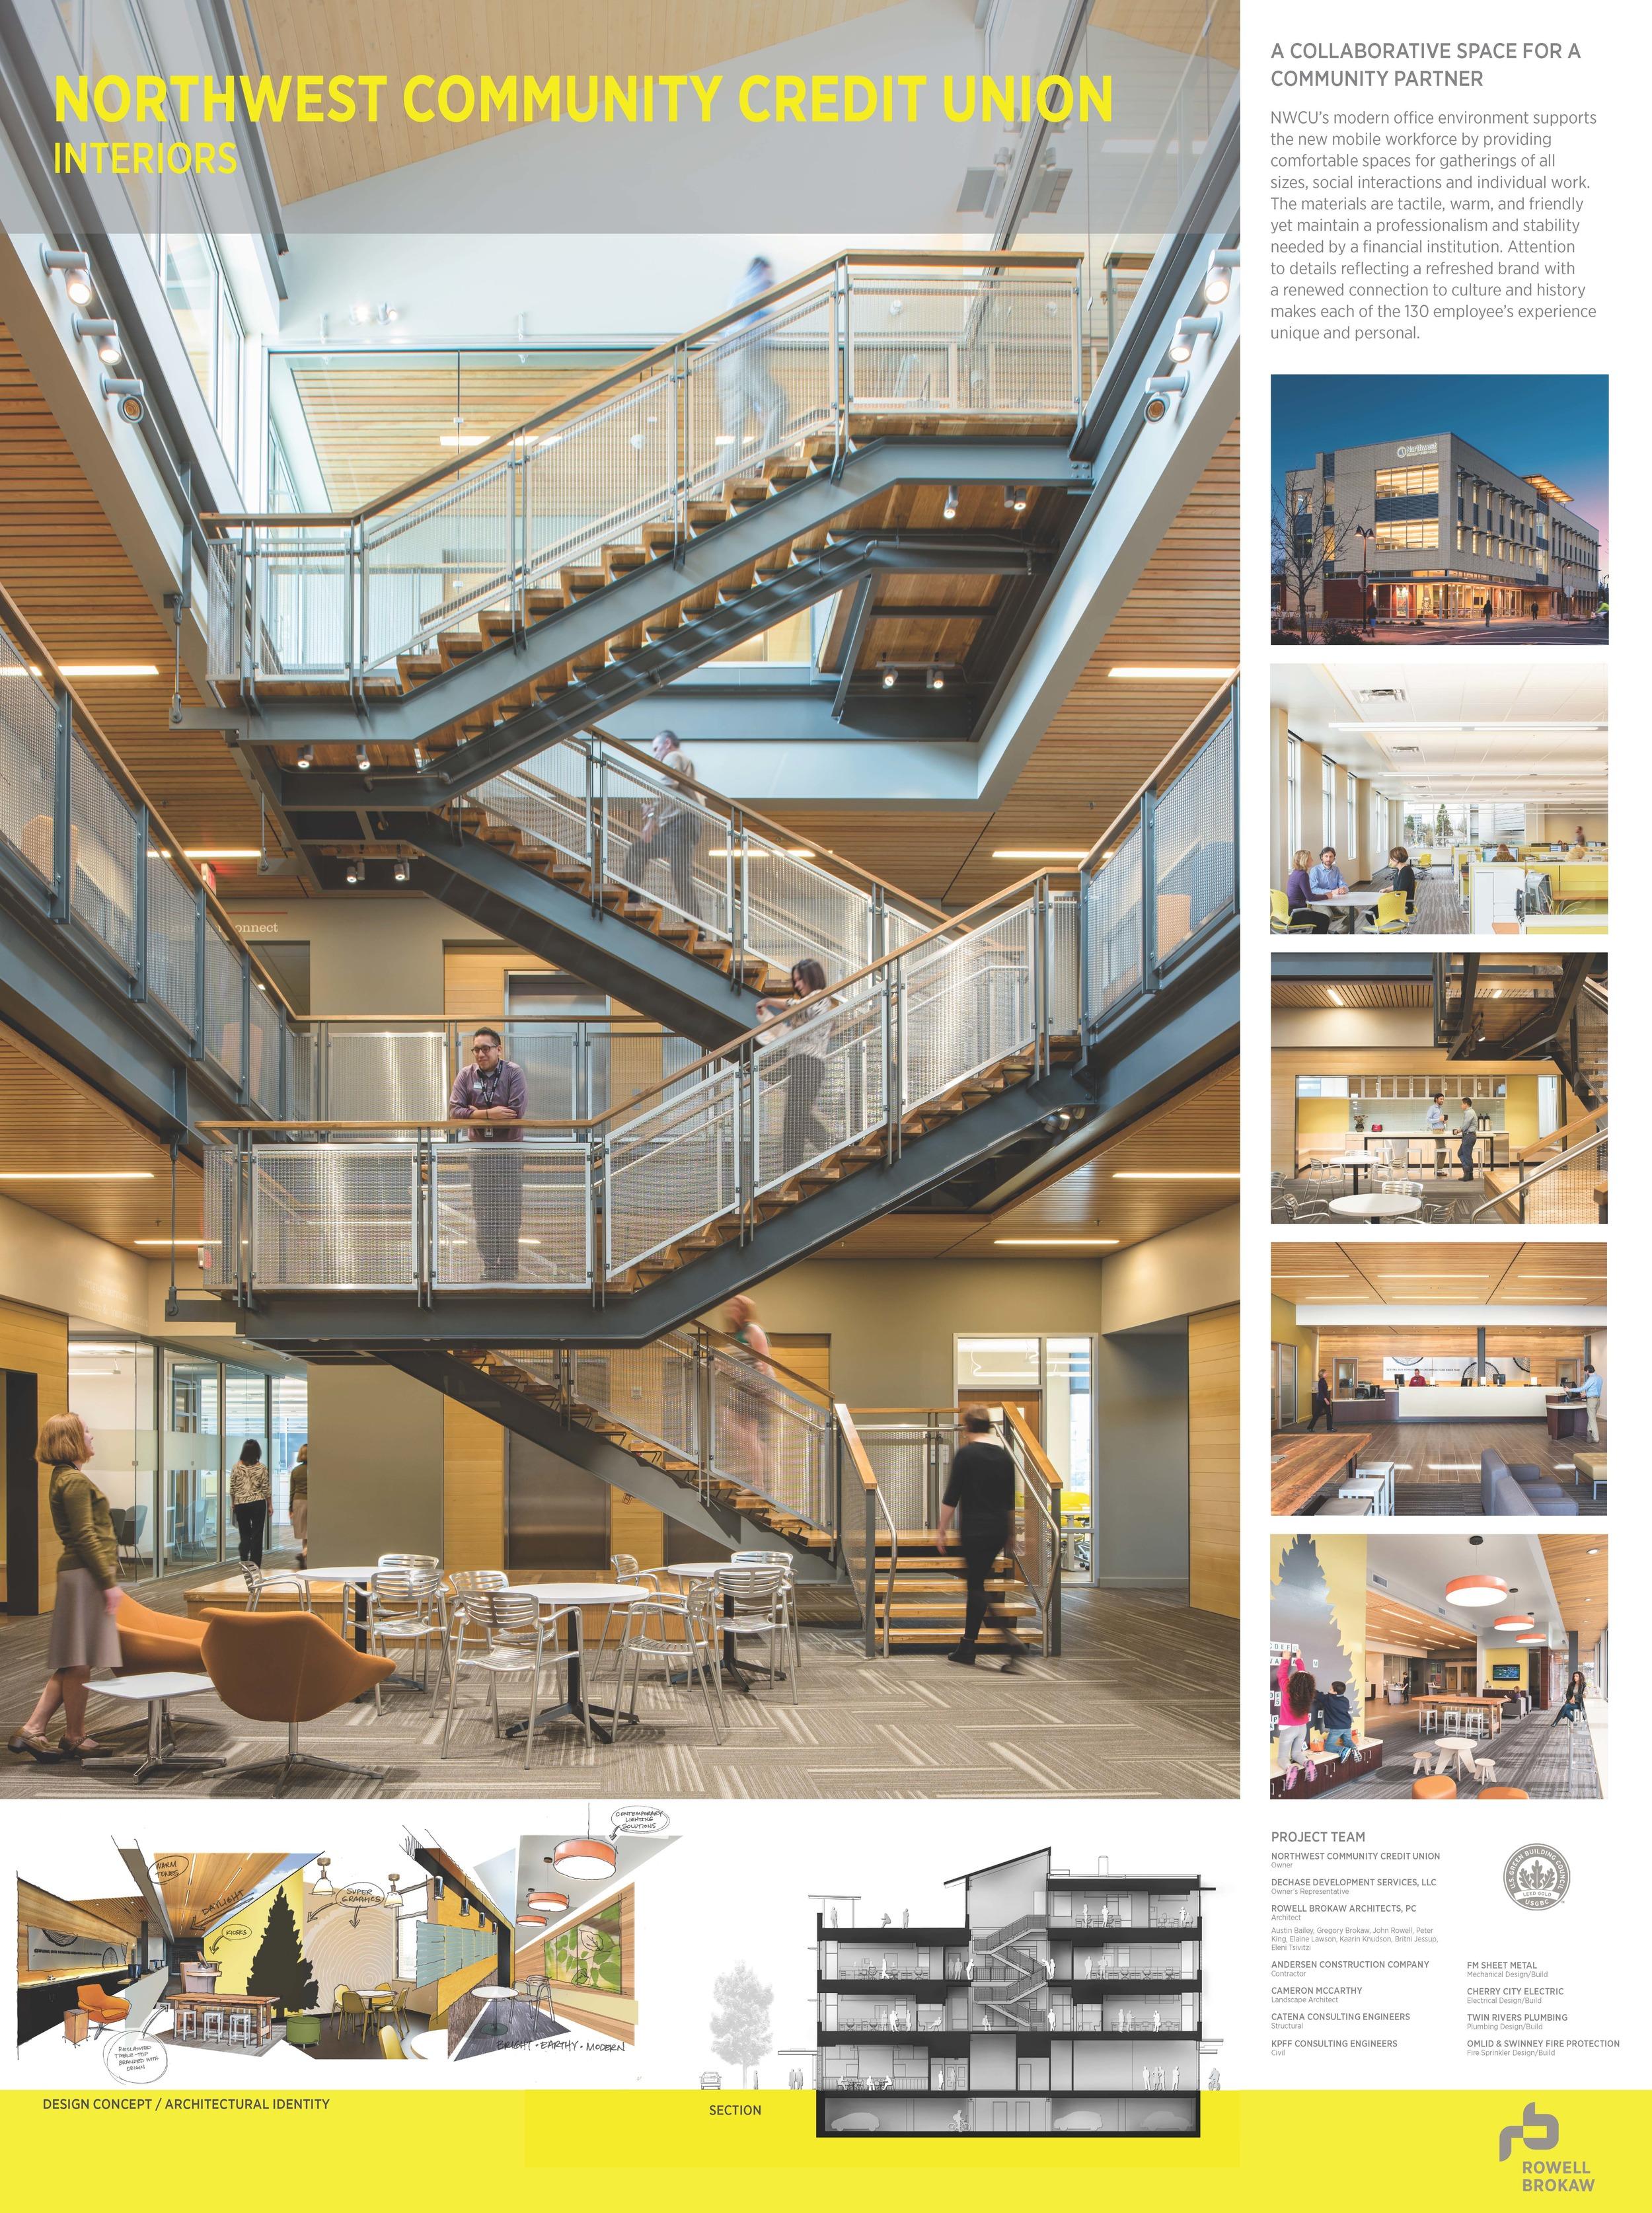 PCA2015_NWCU_Interiors_Final.jpg